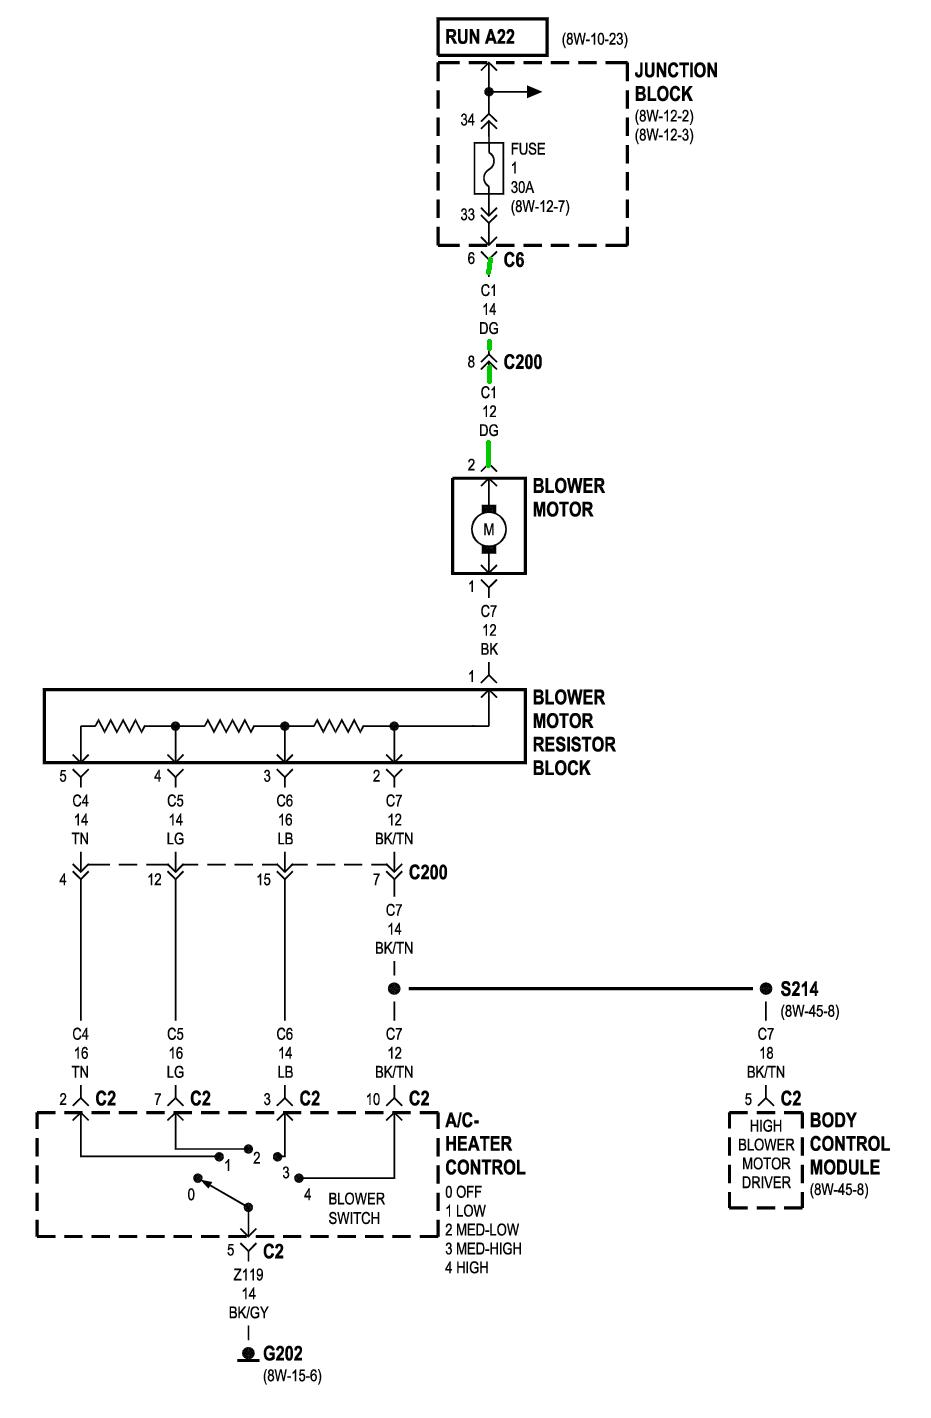 2005 Chrysler Pacifica Timing Belt Diagram On 2005 Pt Cruiser Fuse